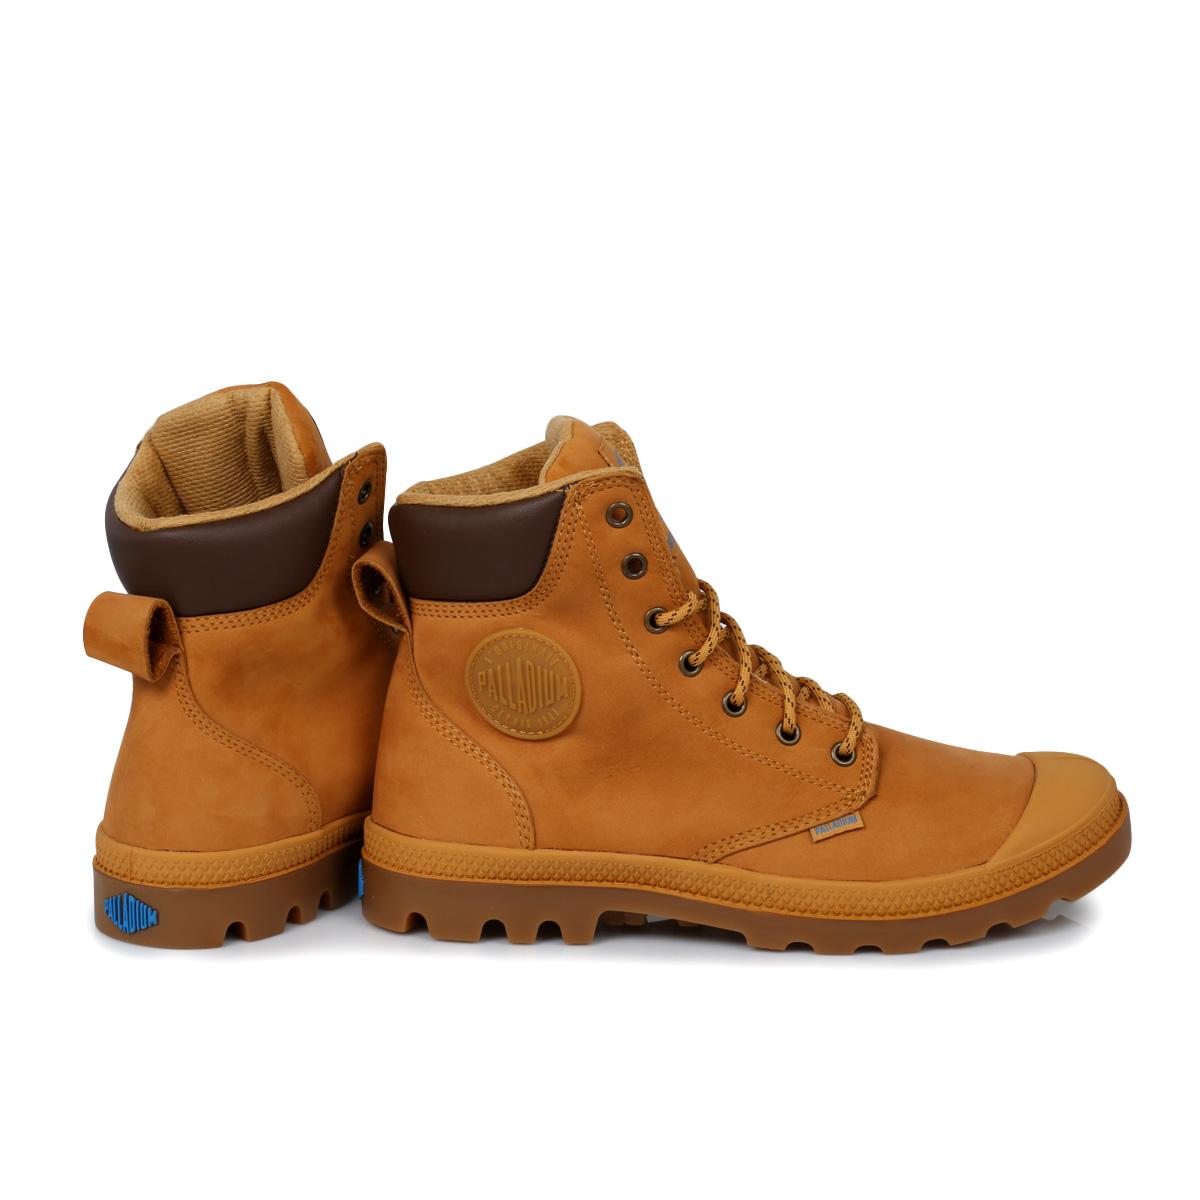 palladium brown waterproof sport cuff mens boots size